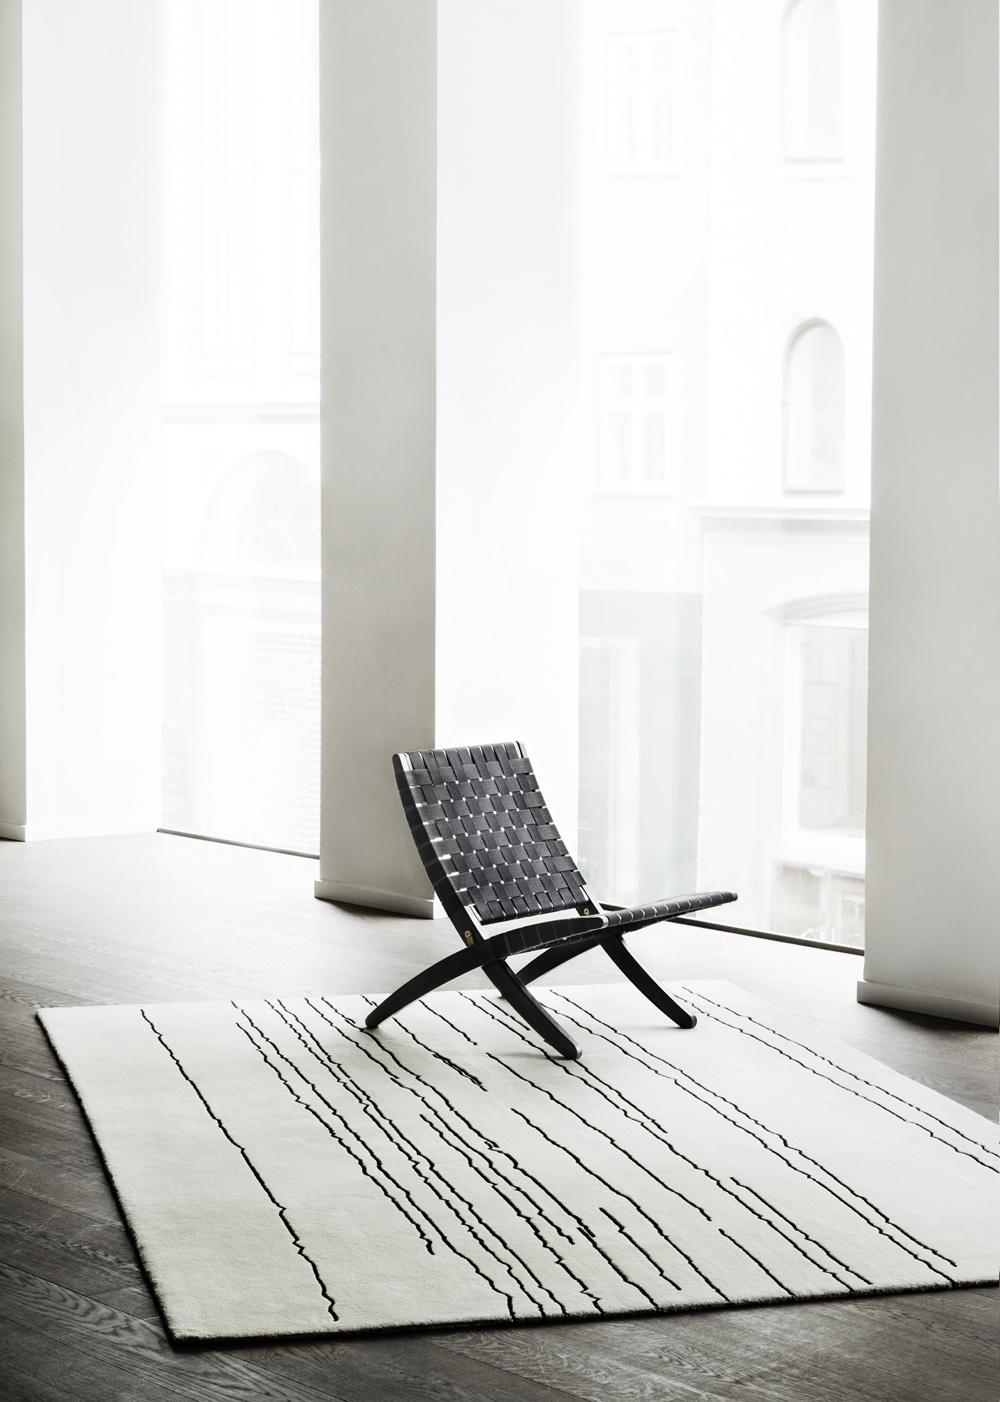 Woodlines rug designed by artist Naja Utzon Popov for Carl Hansen & Søn. Image courtesy ofCarl Hansen & Søn.